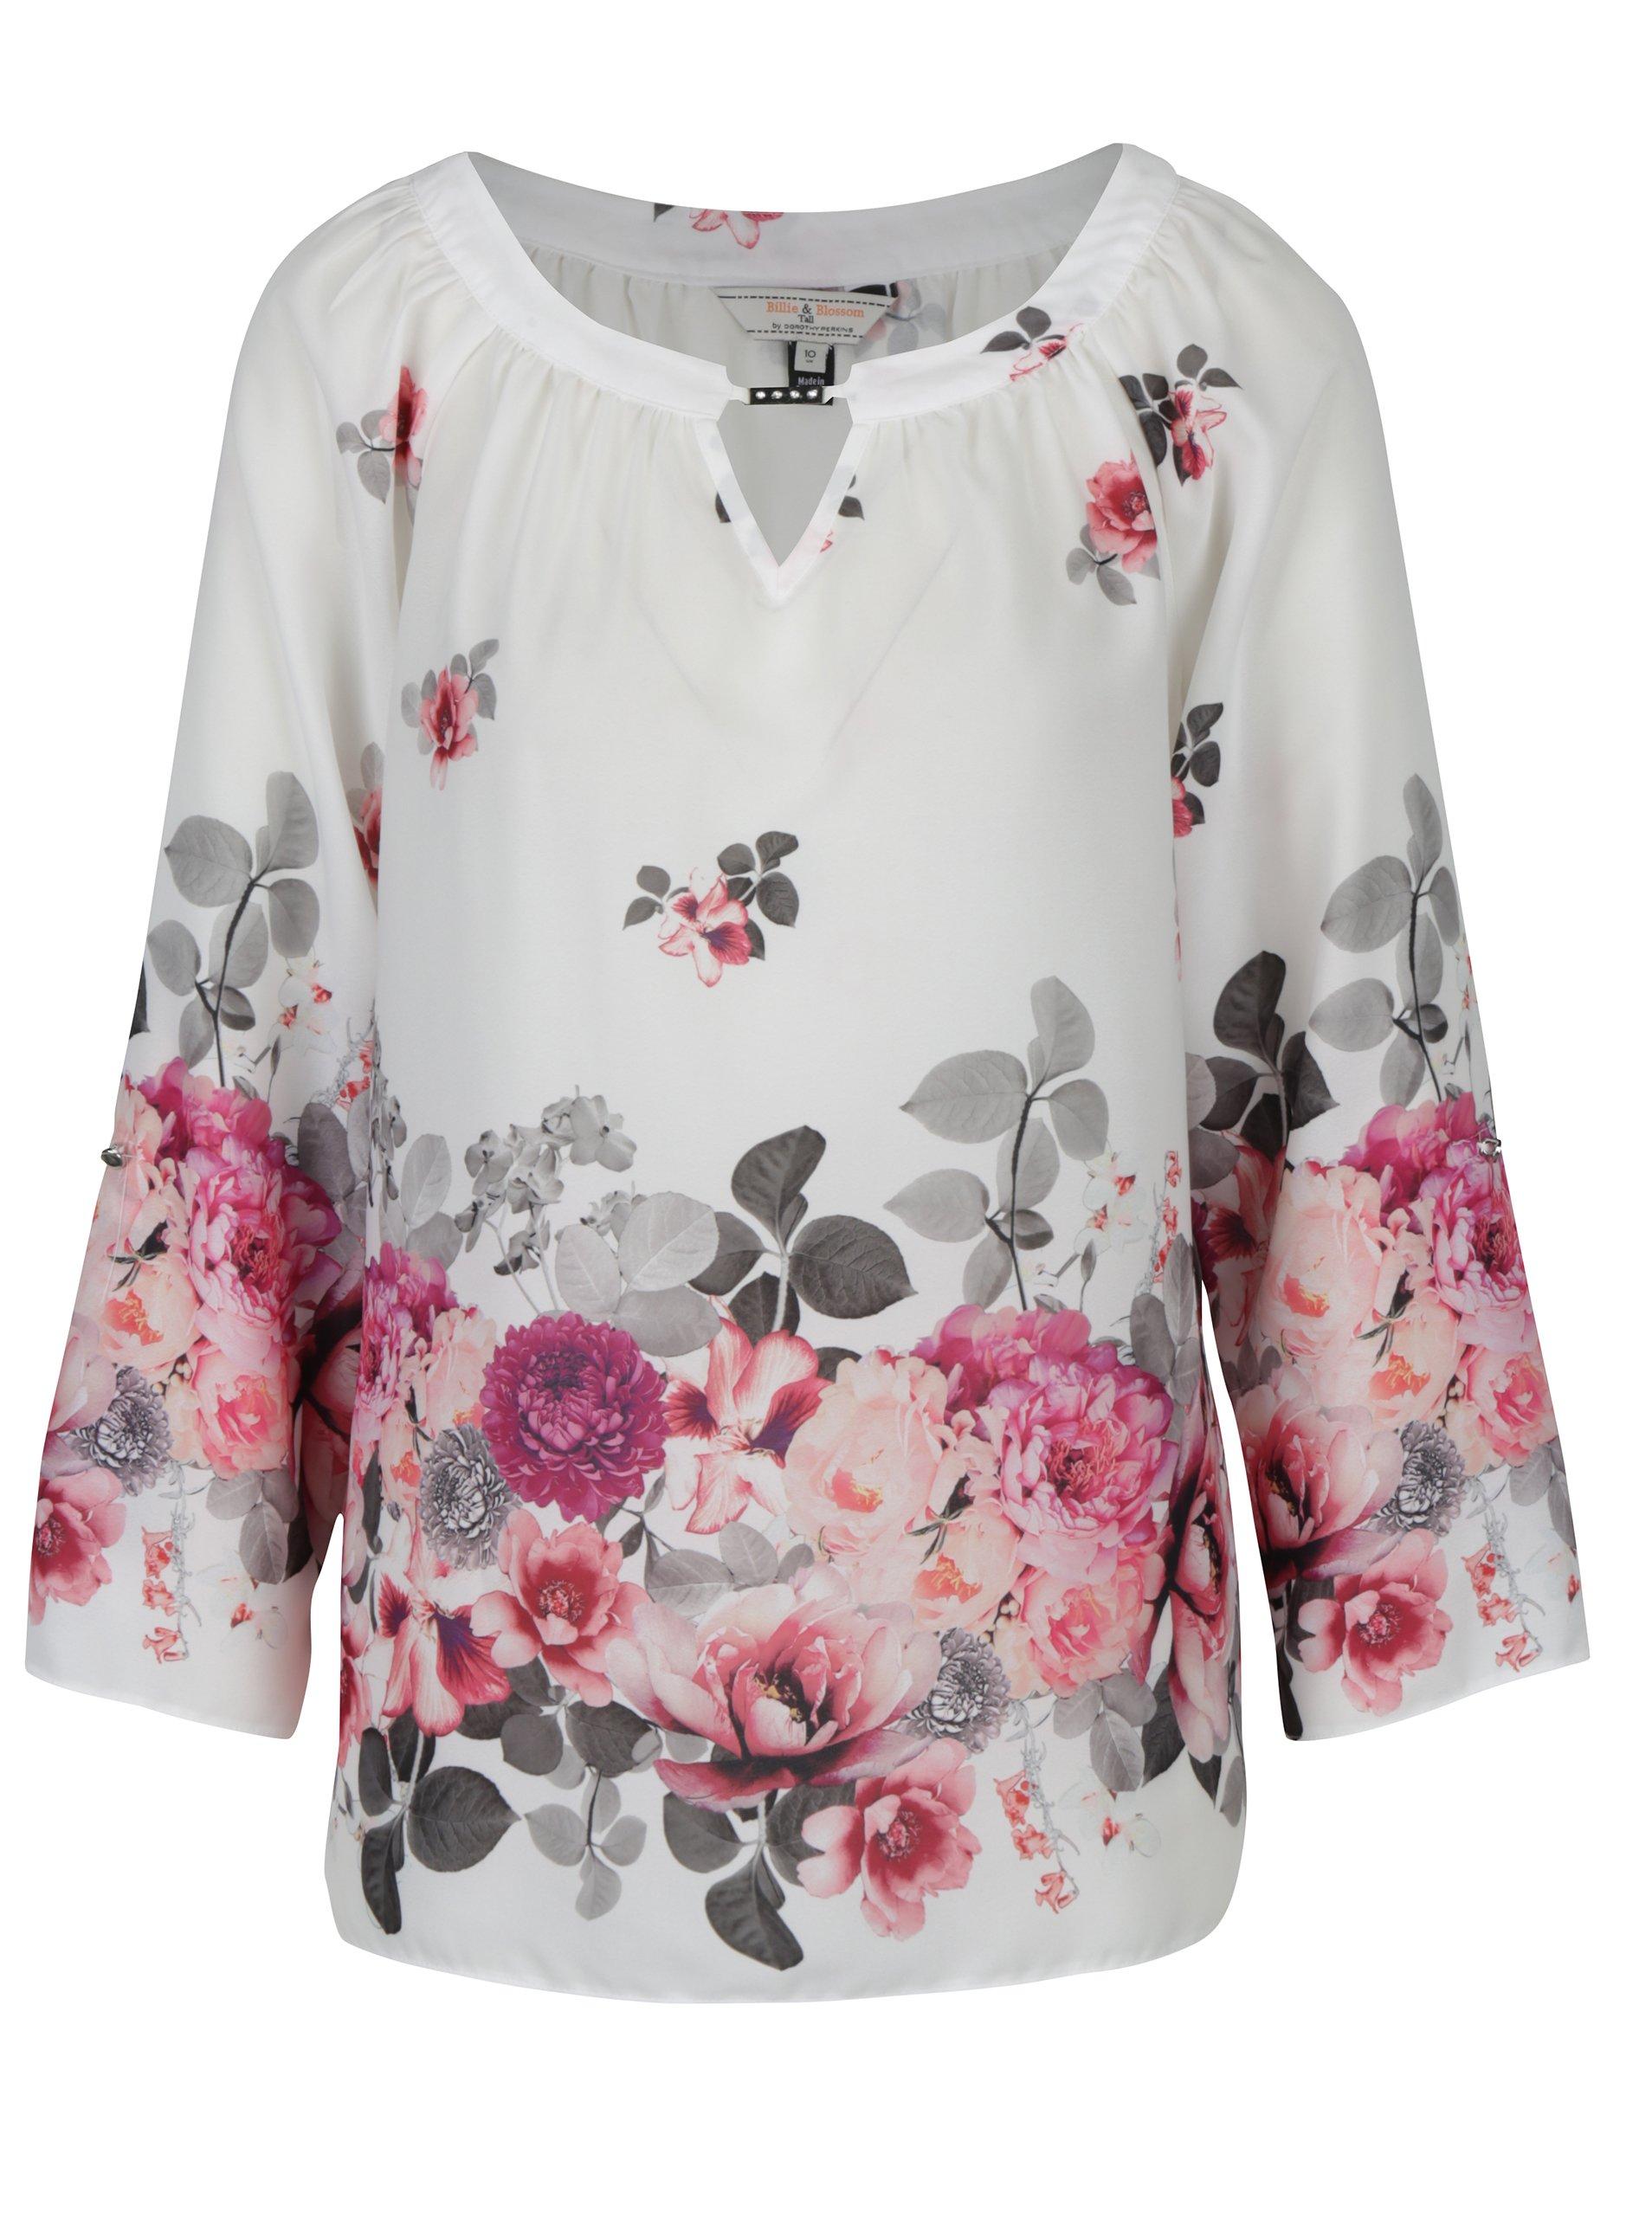 Bílá květovaná halenka Billie & Blossom